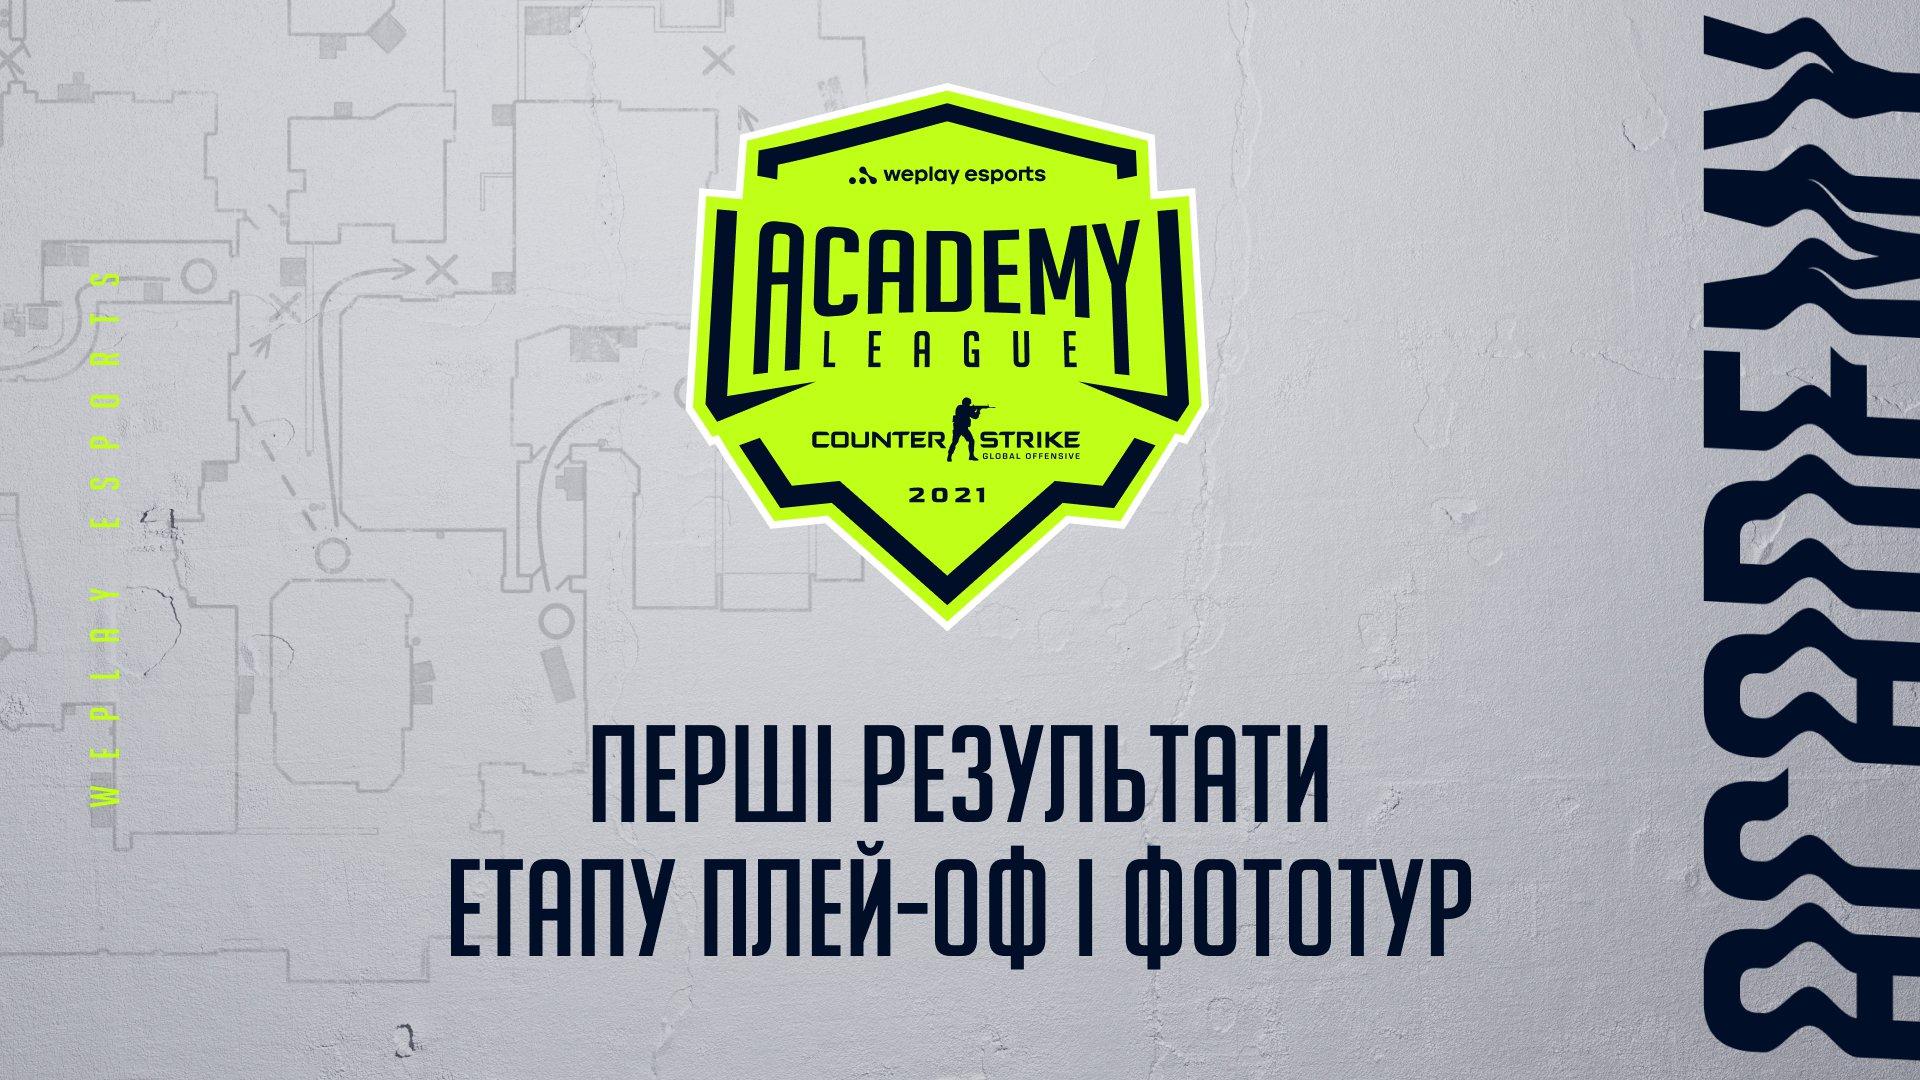 WePlay Academy League Season 1: перші результати етапу плей-оф і фототур. Зображення: WePlay Holding